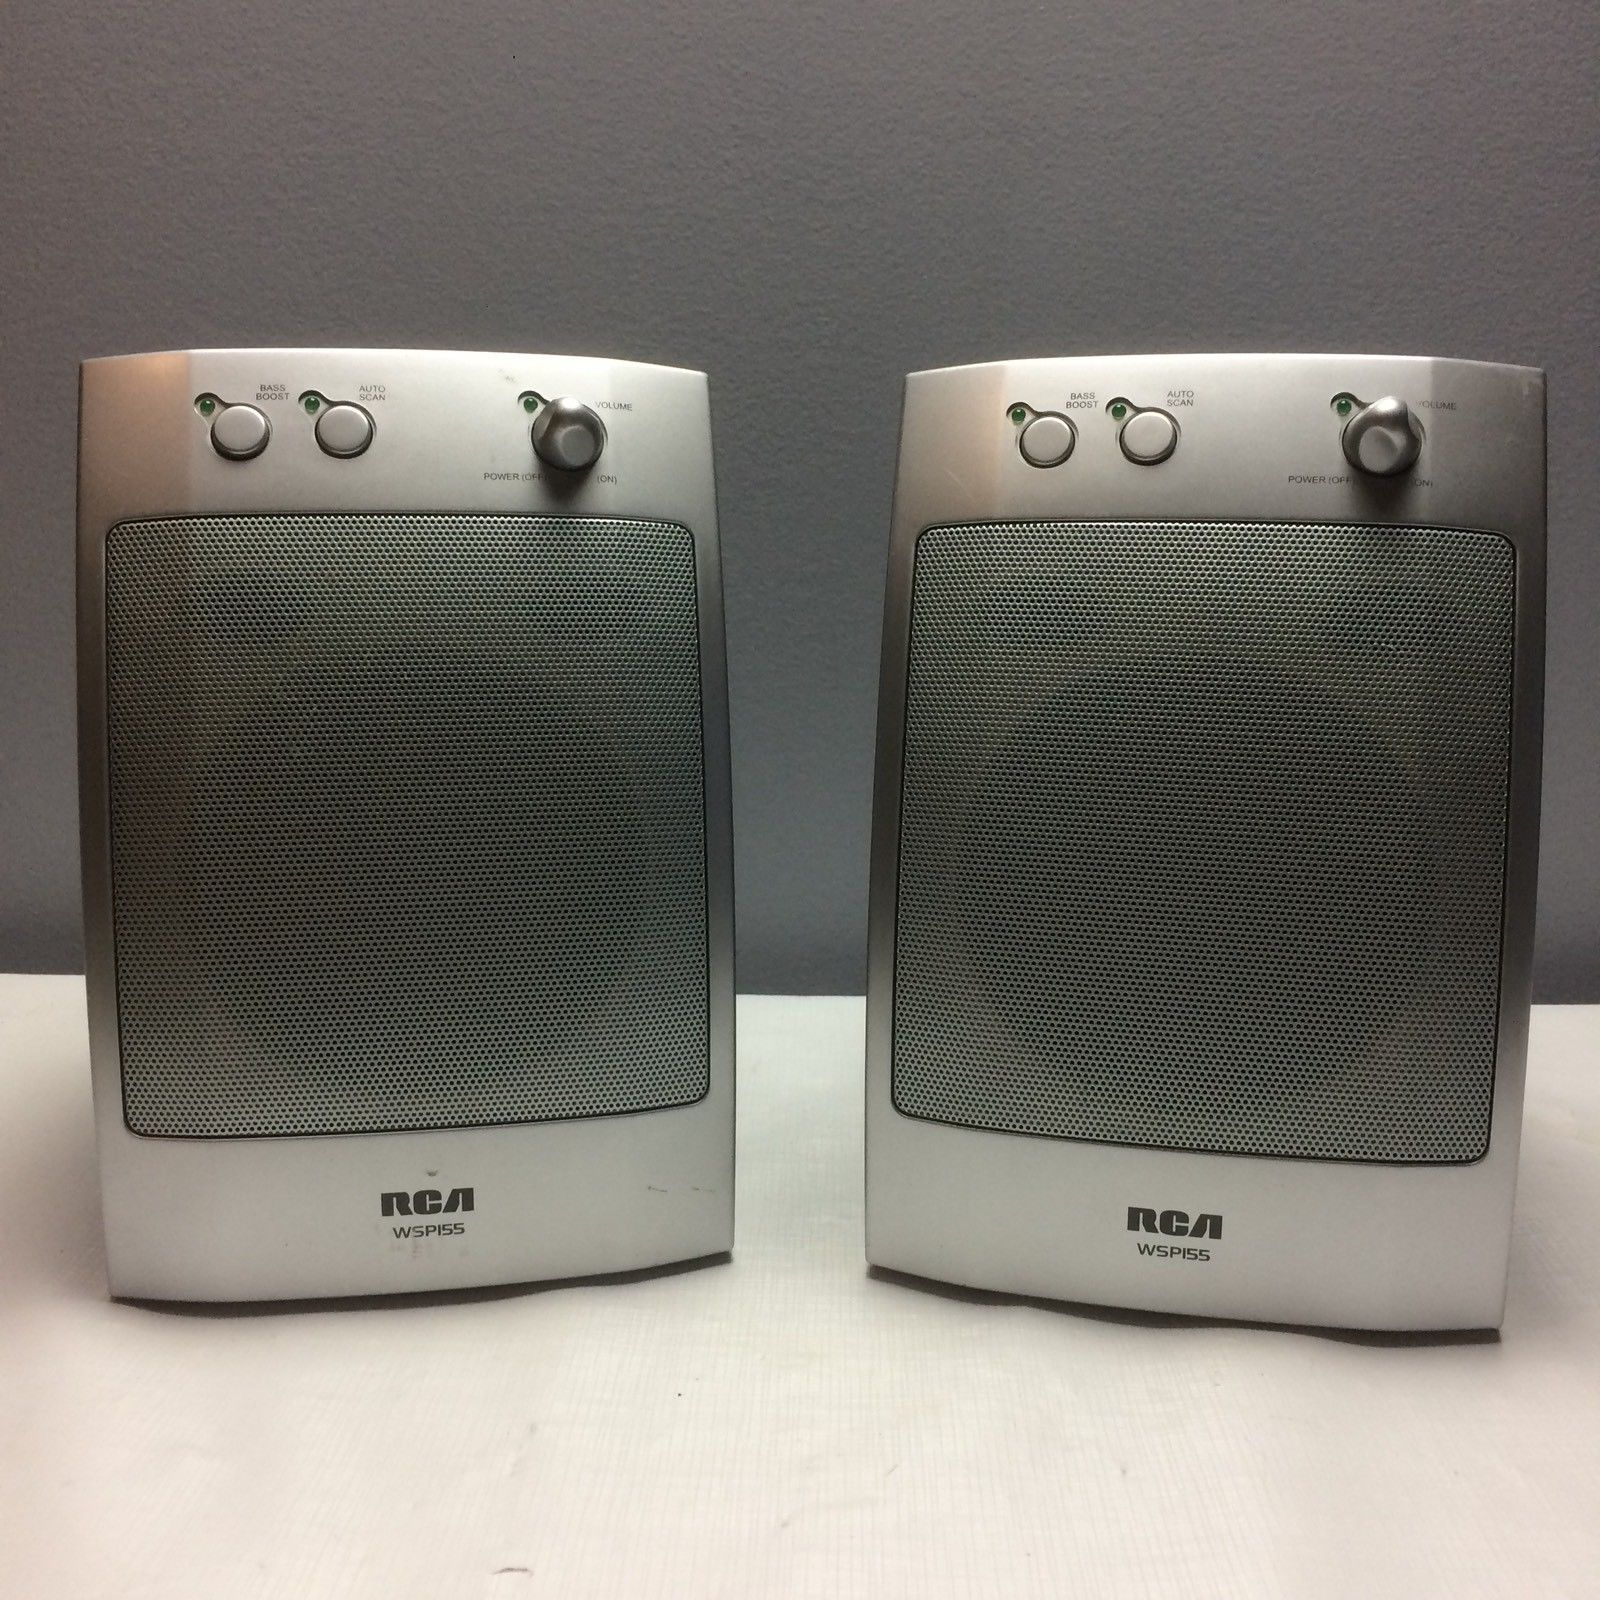 Rca Wireless Ac Speakers - WIRE Center •